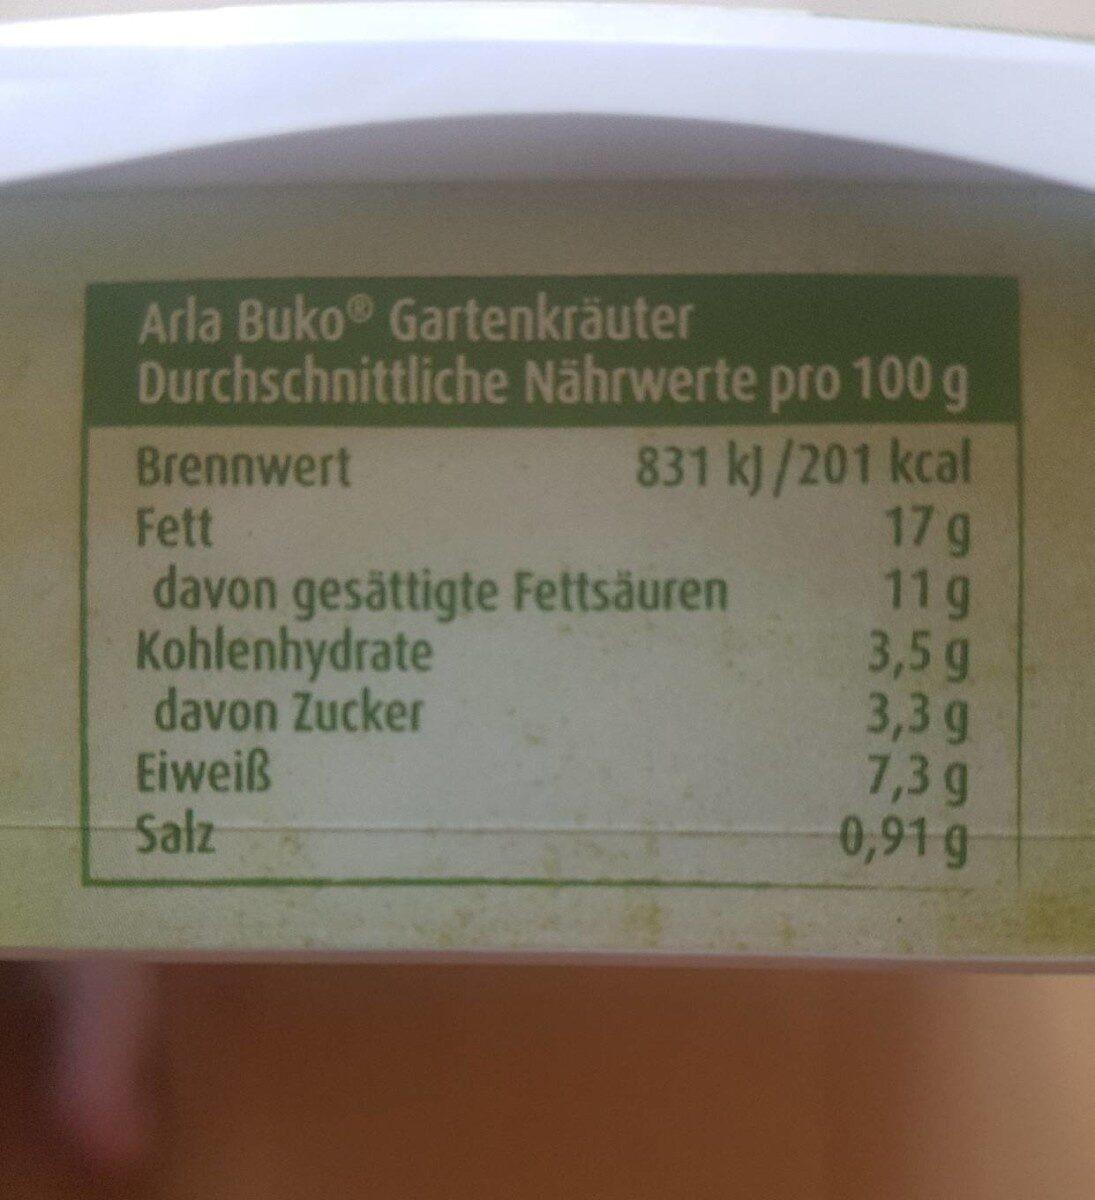 Buko Garten Kräuter - Nährwertangaben - de